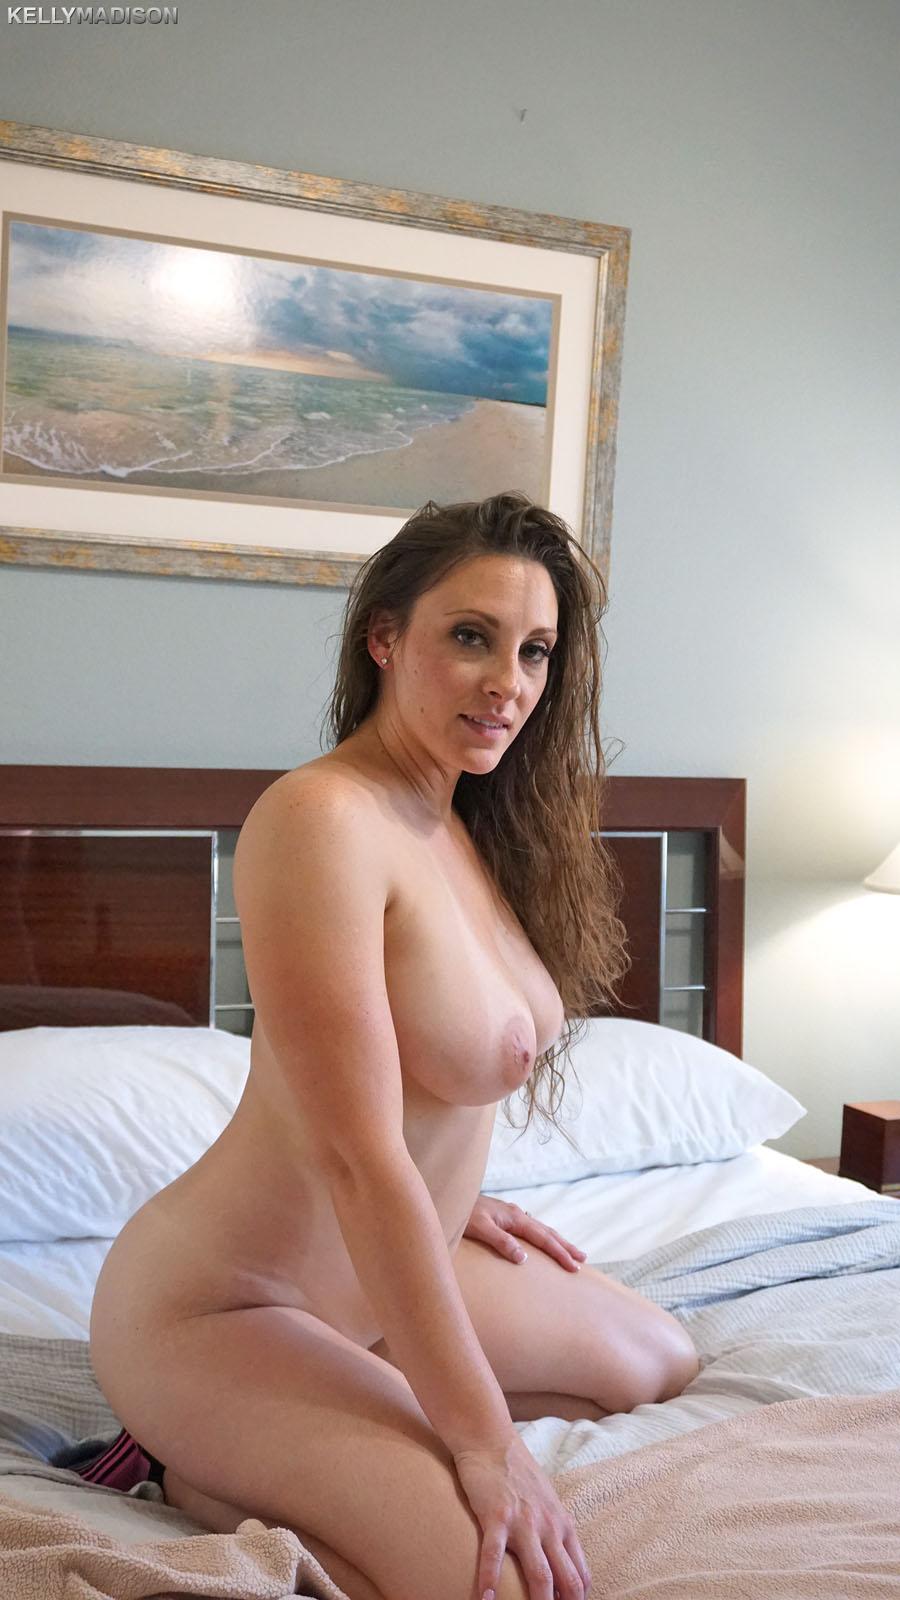 Melanie Hicks Naked Bedroom Kelly Madison - Curvy Erotic